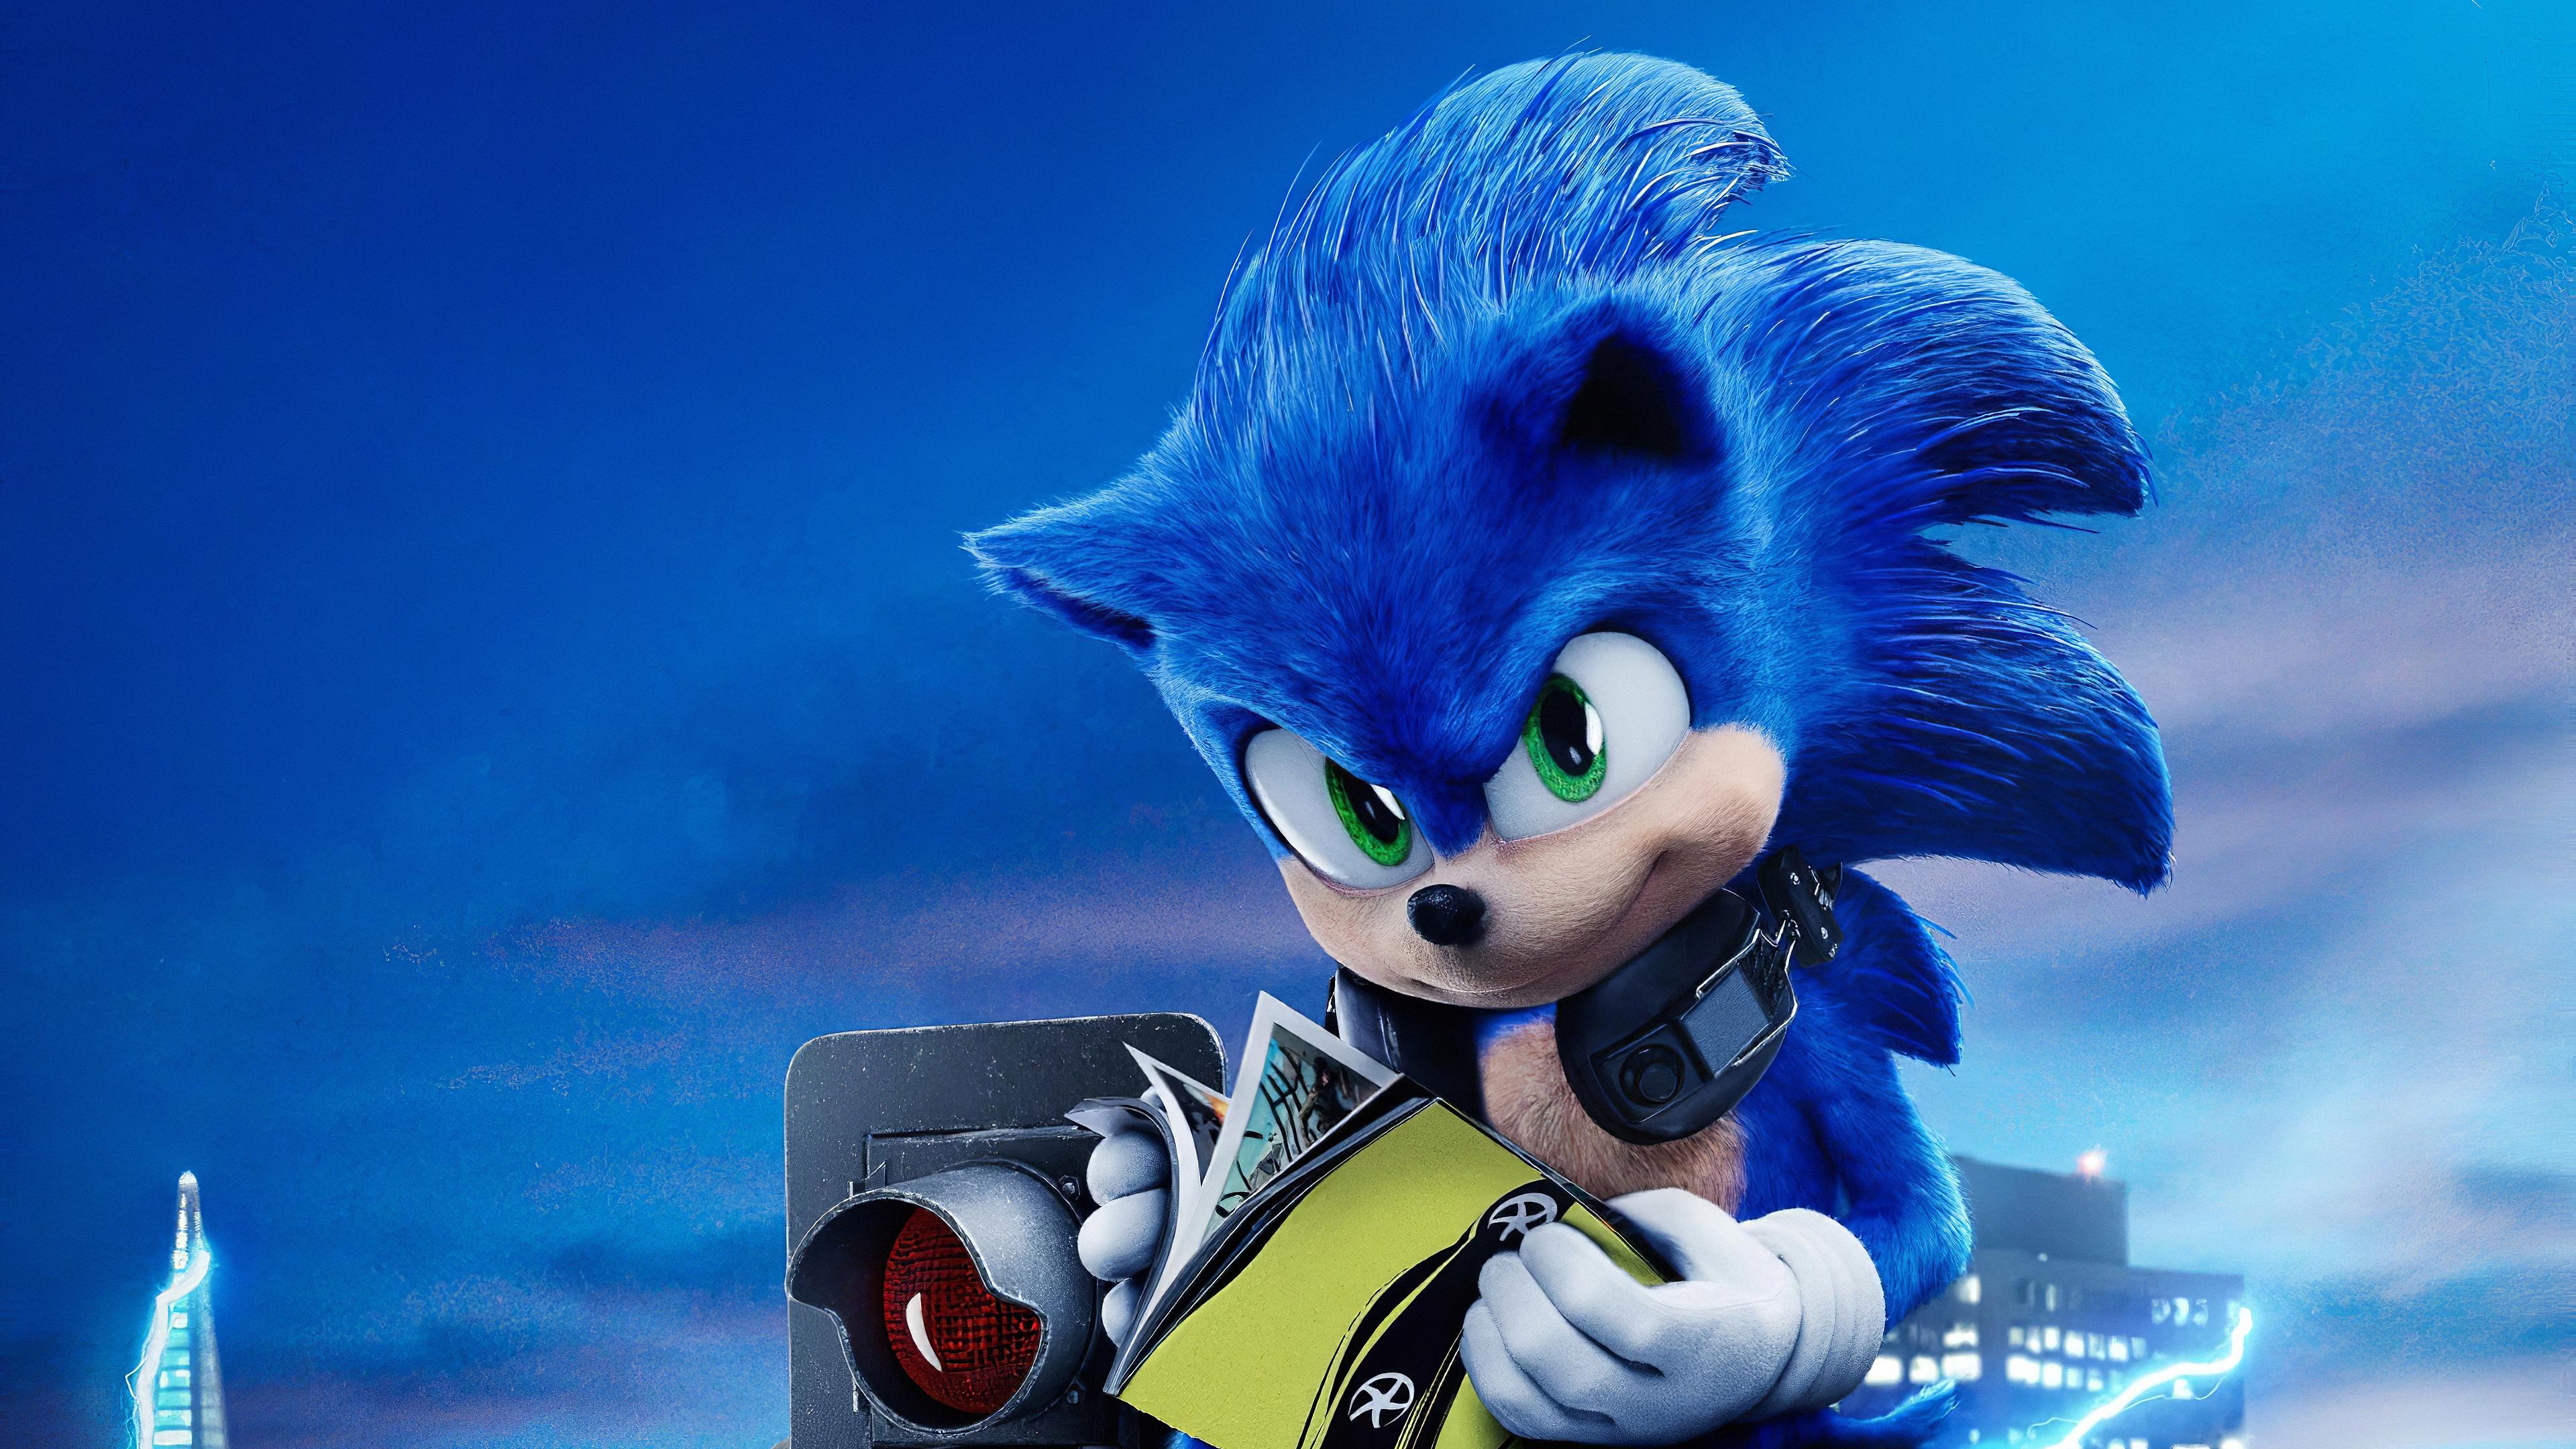 sonic the hedgehog movie wallpaper 2020